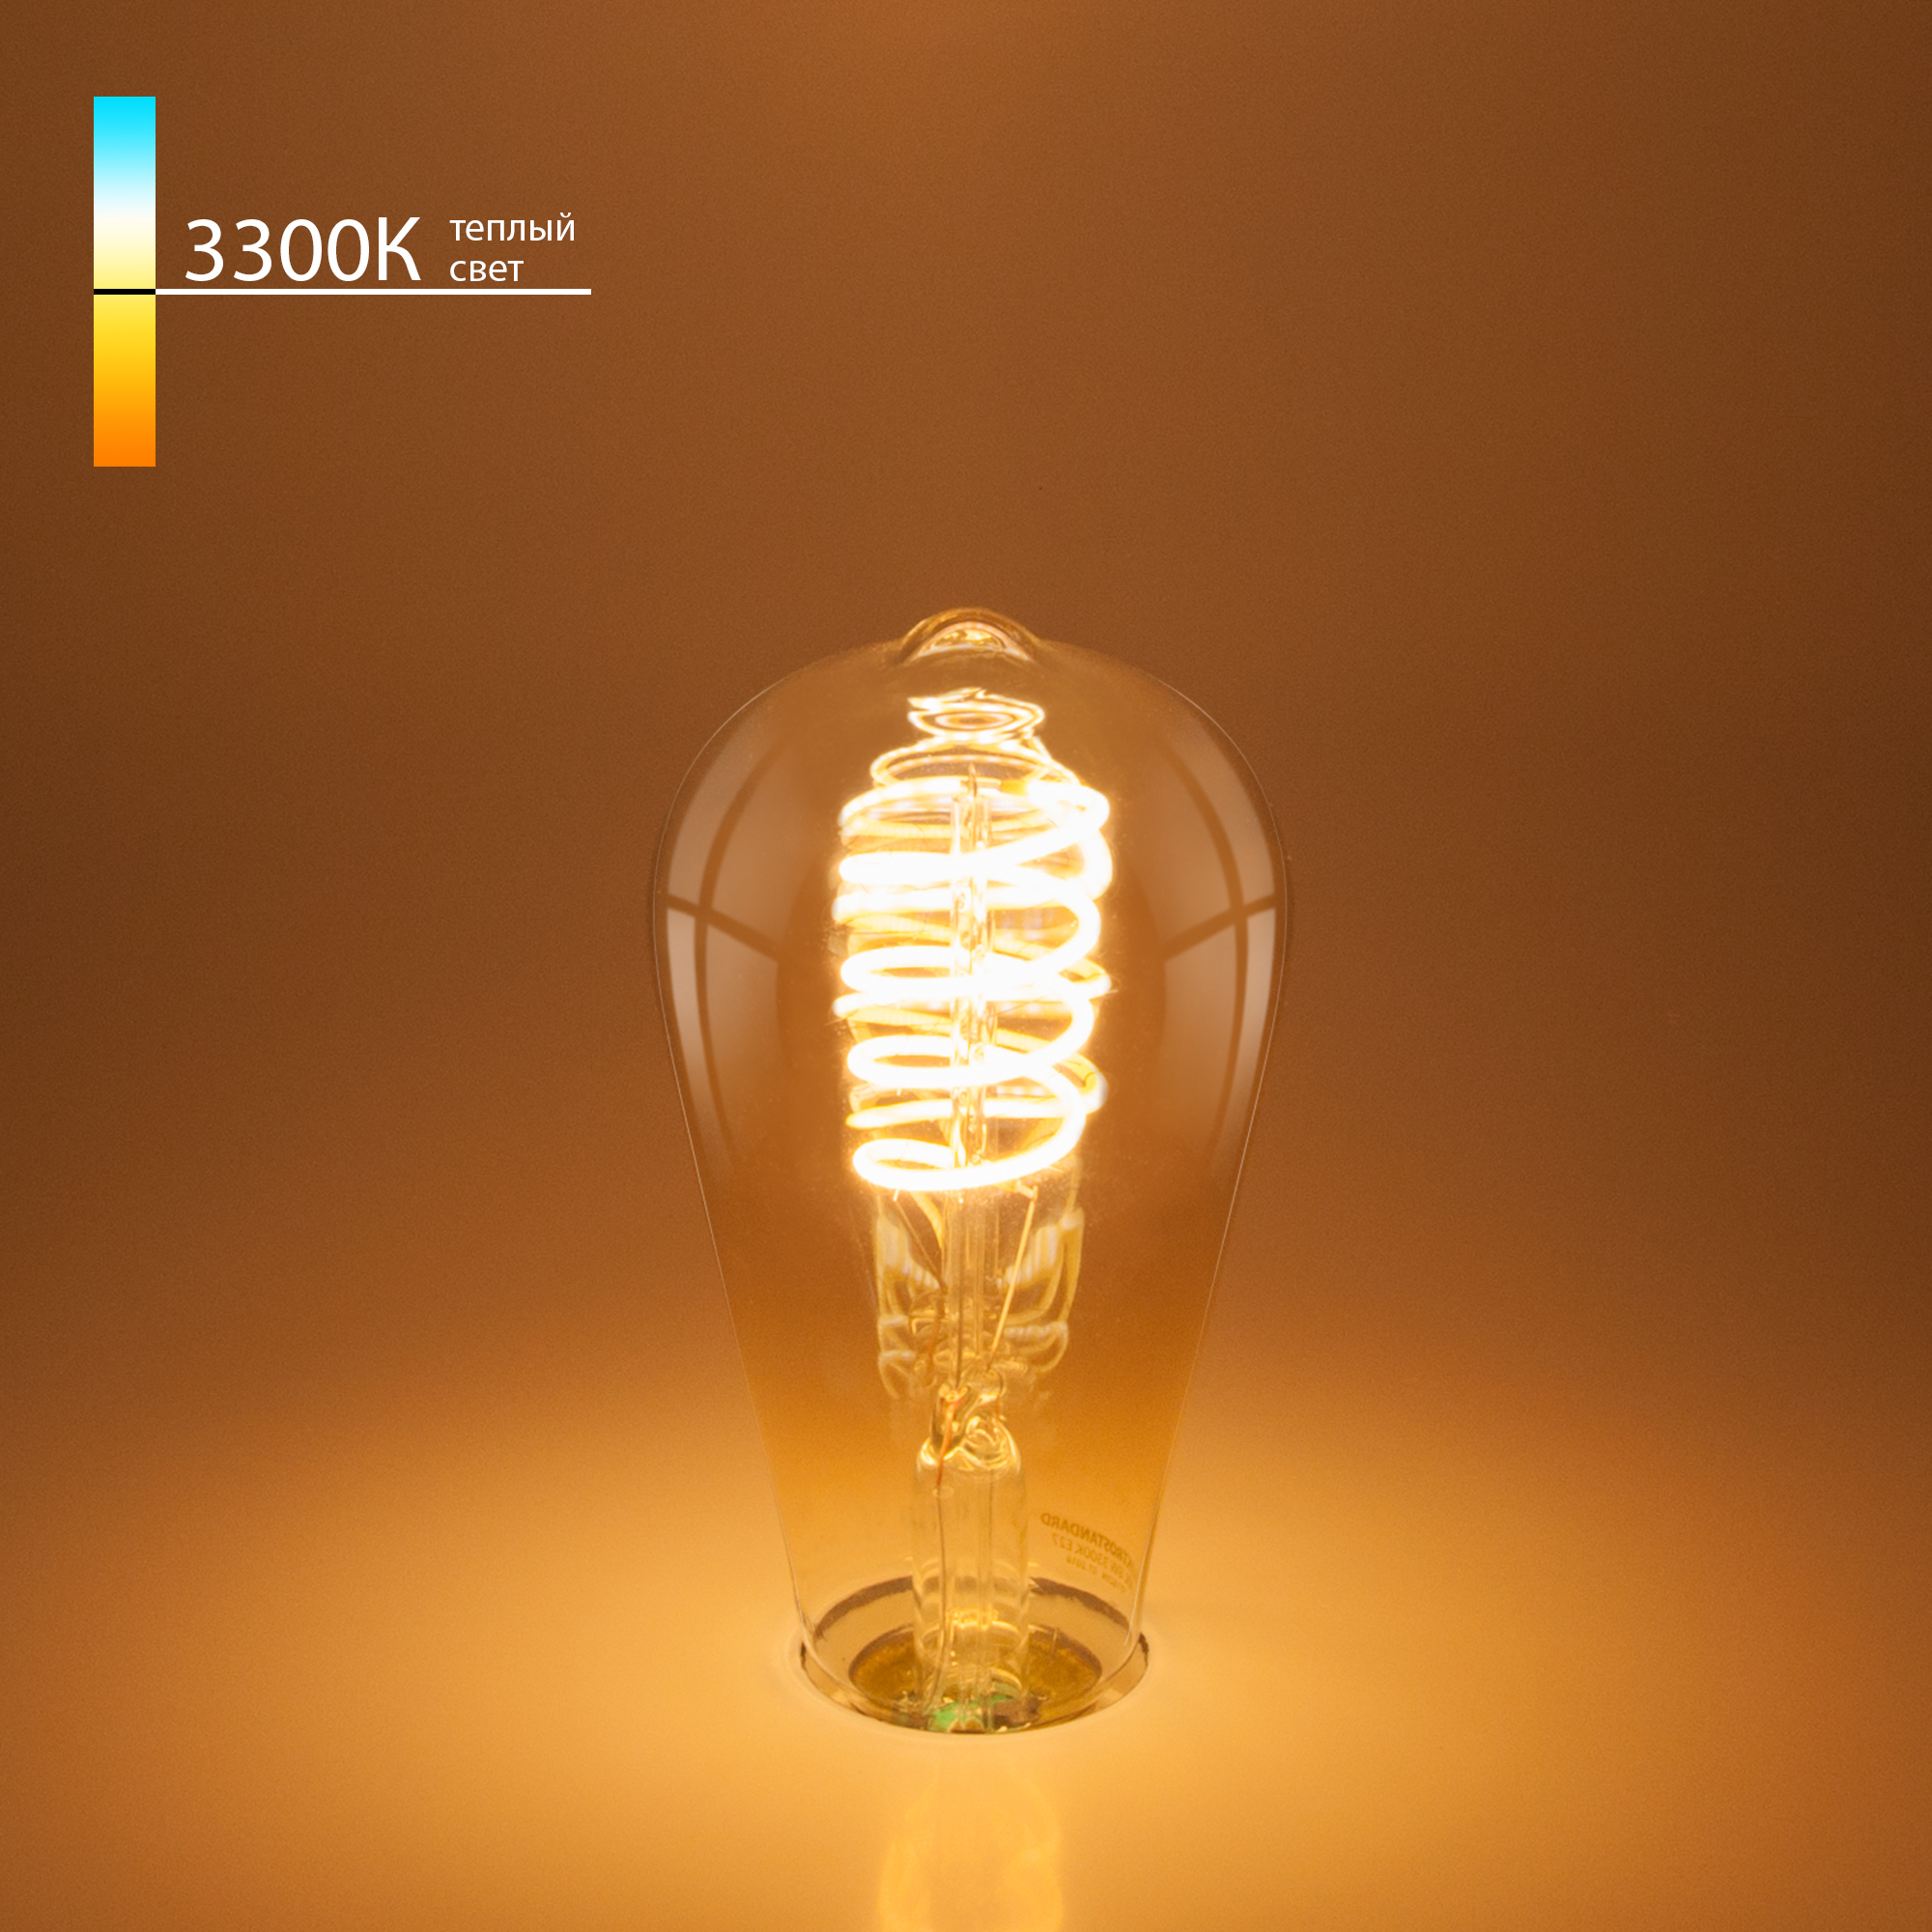 Филаментная светодиодная лампа FDL 8W 3300K E27